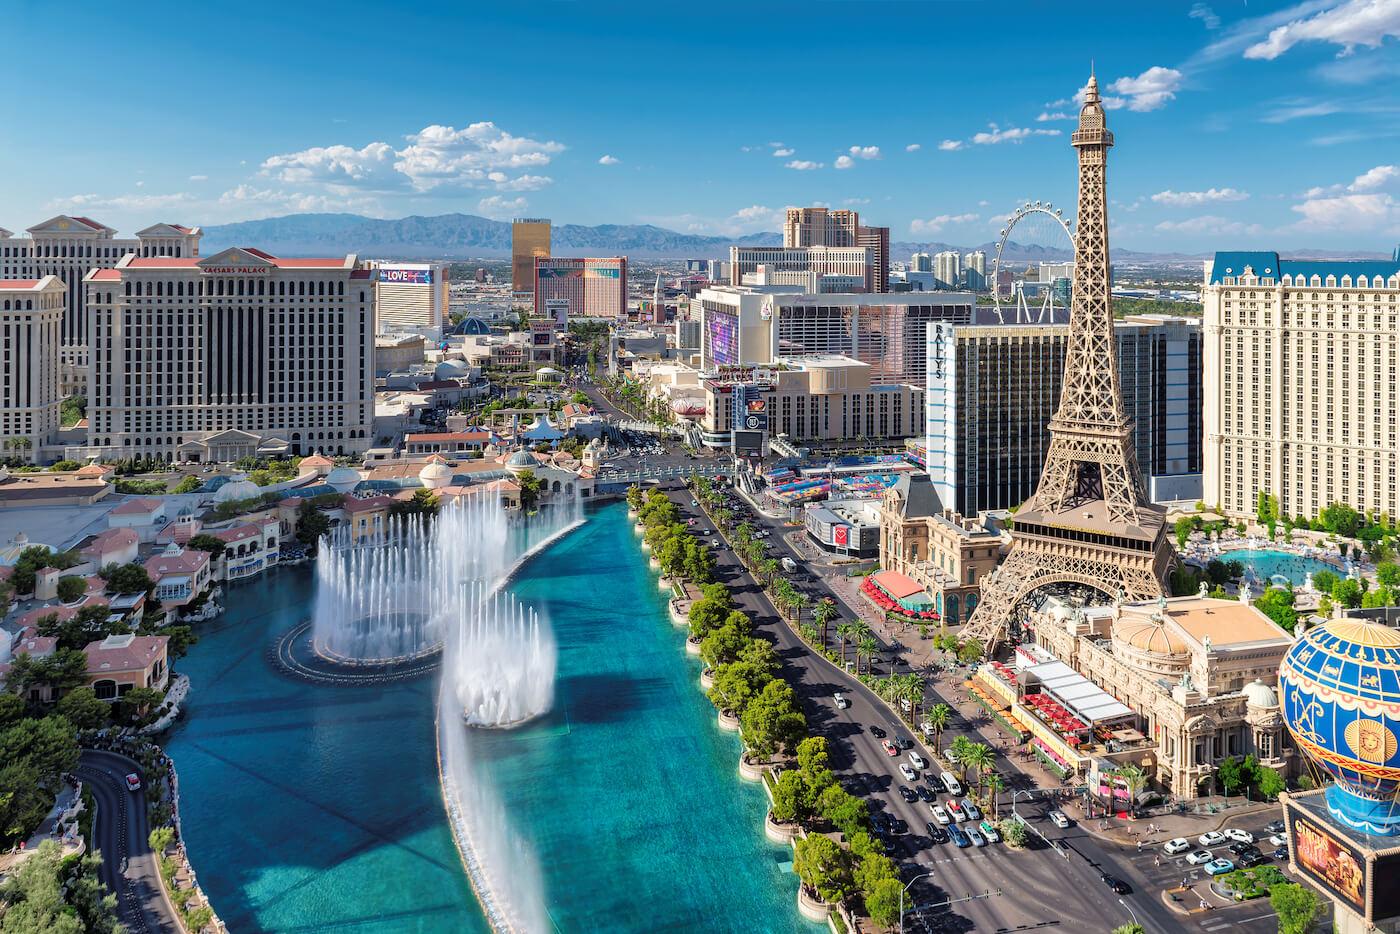 Stedentrip Las Vegas tips (1)